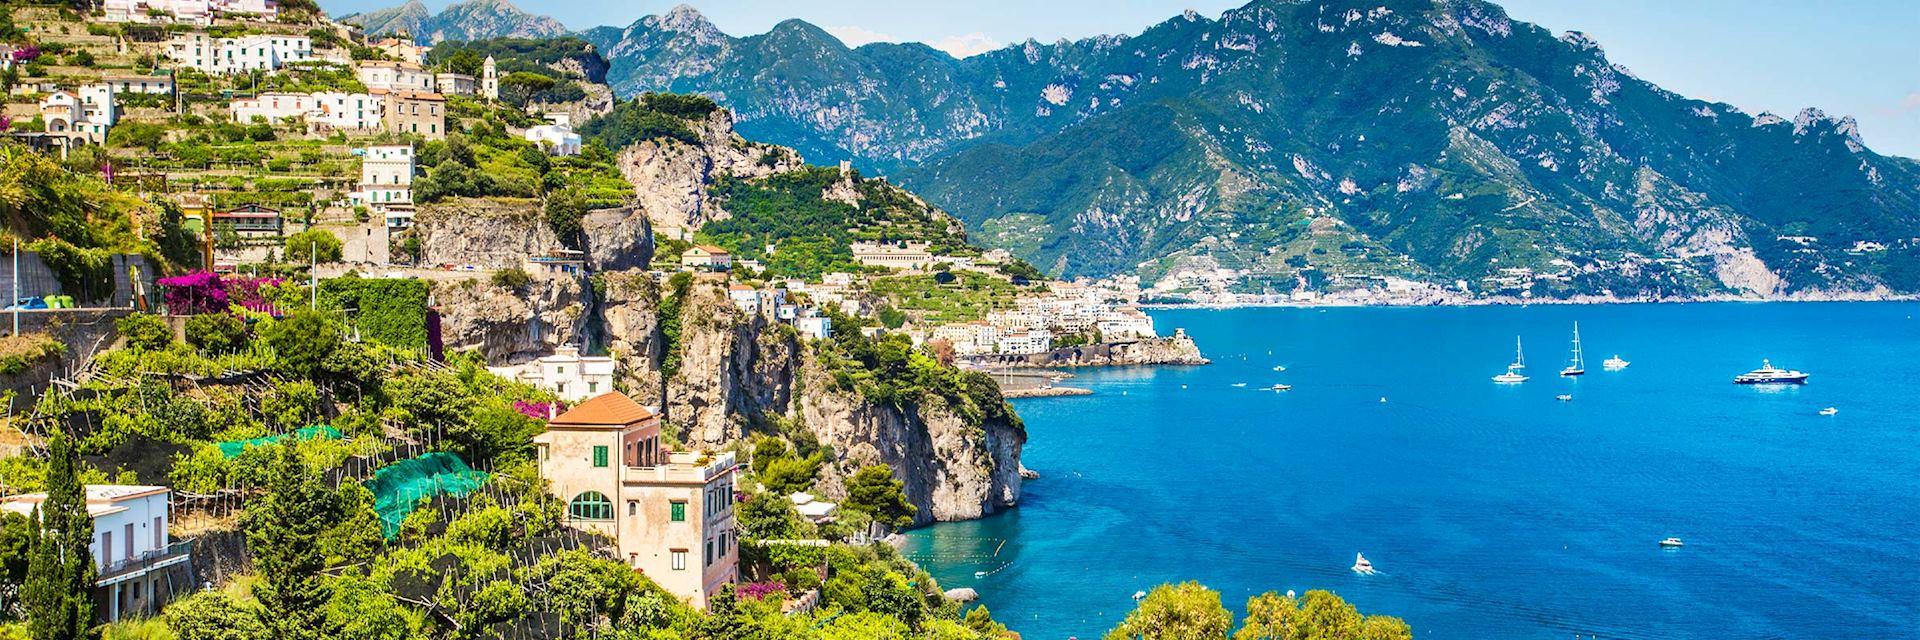 Capri coastline, Italy